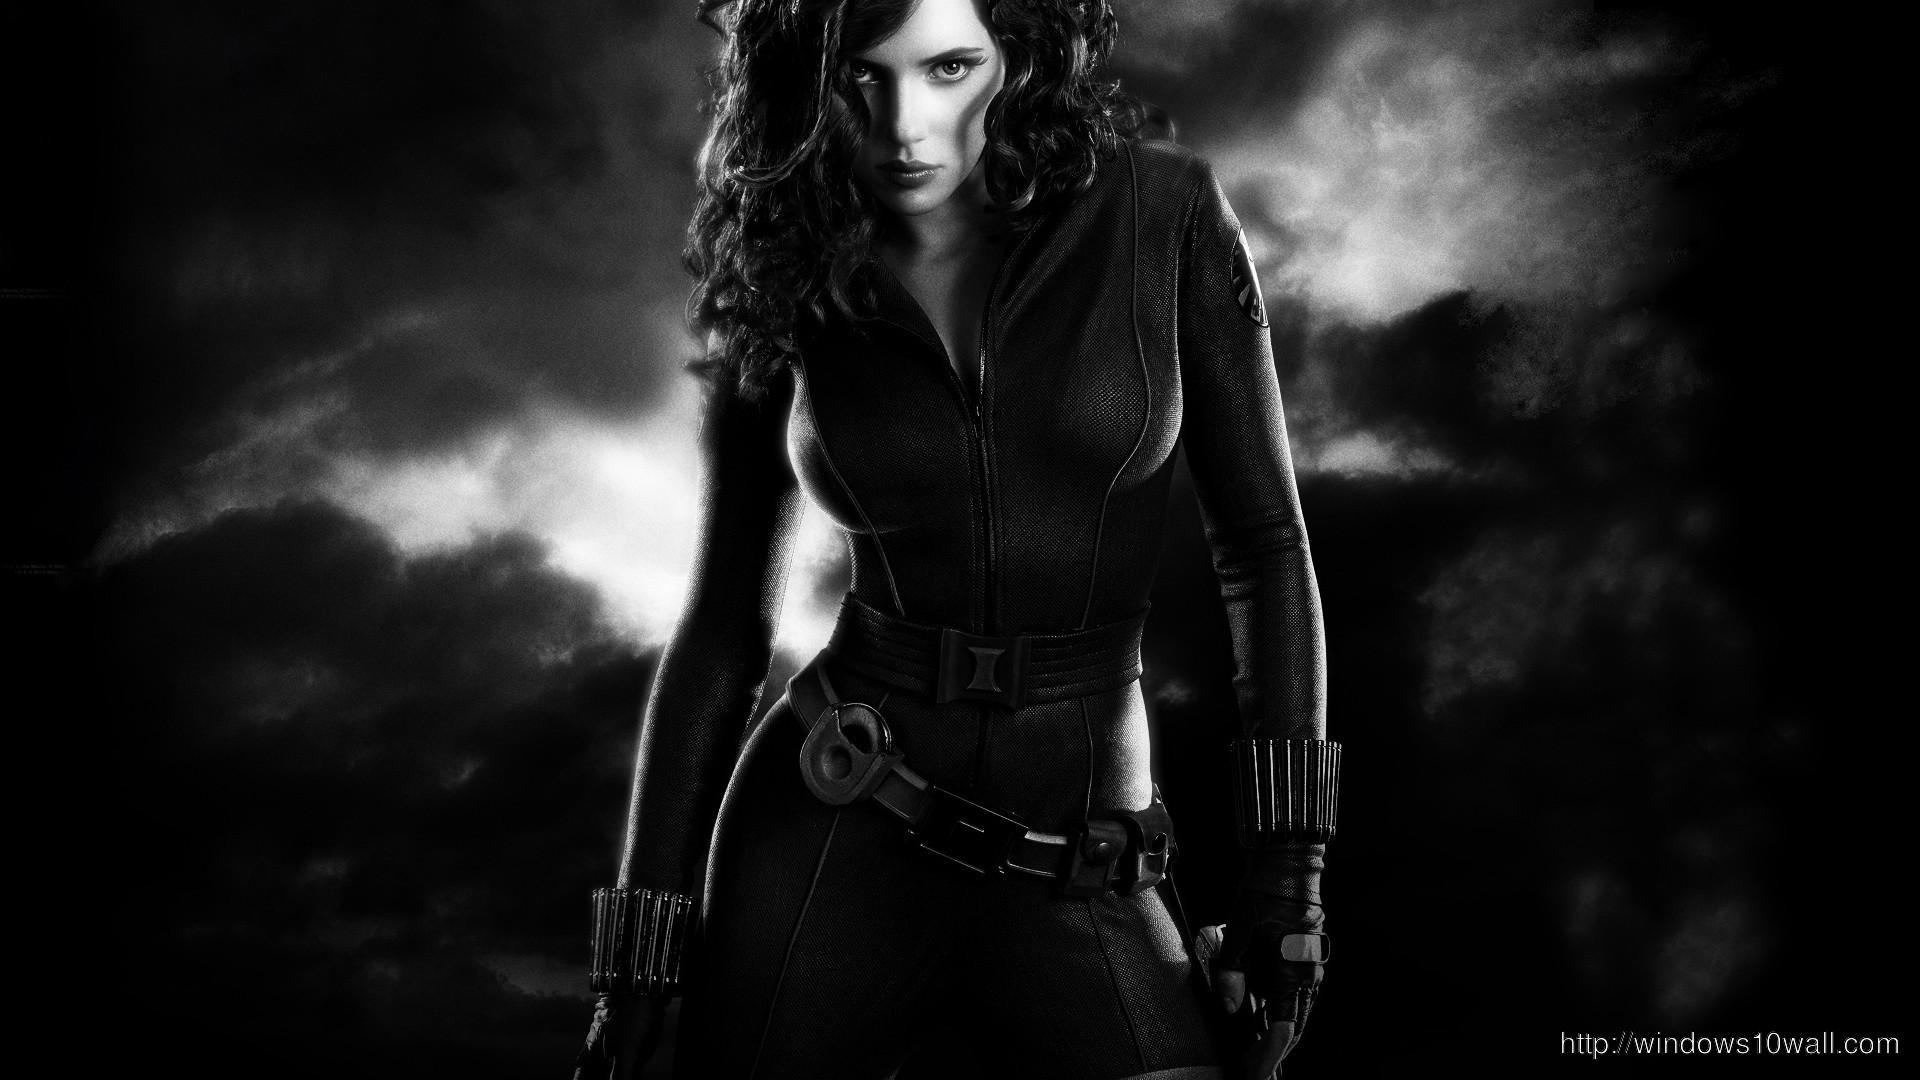 Natasha Romanoff Avengers Wallpaper Windows 10 Wallpapers